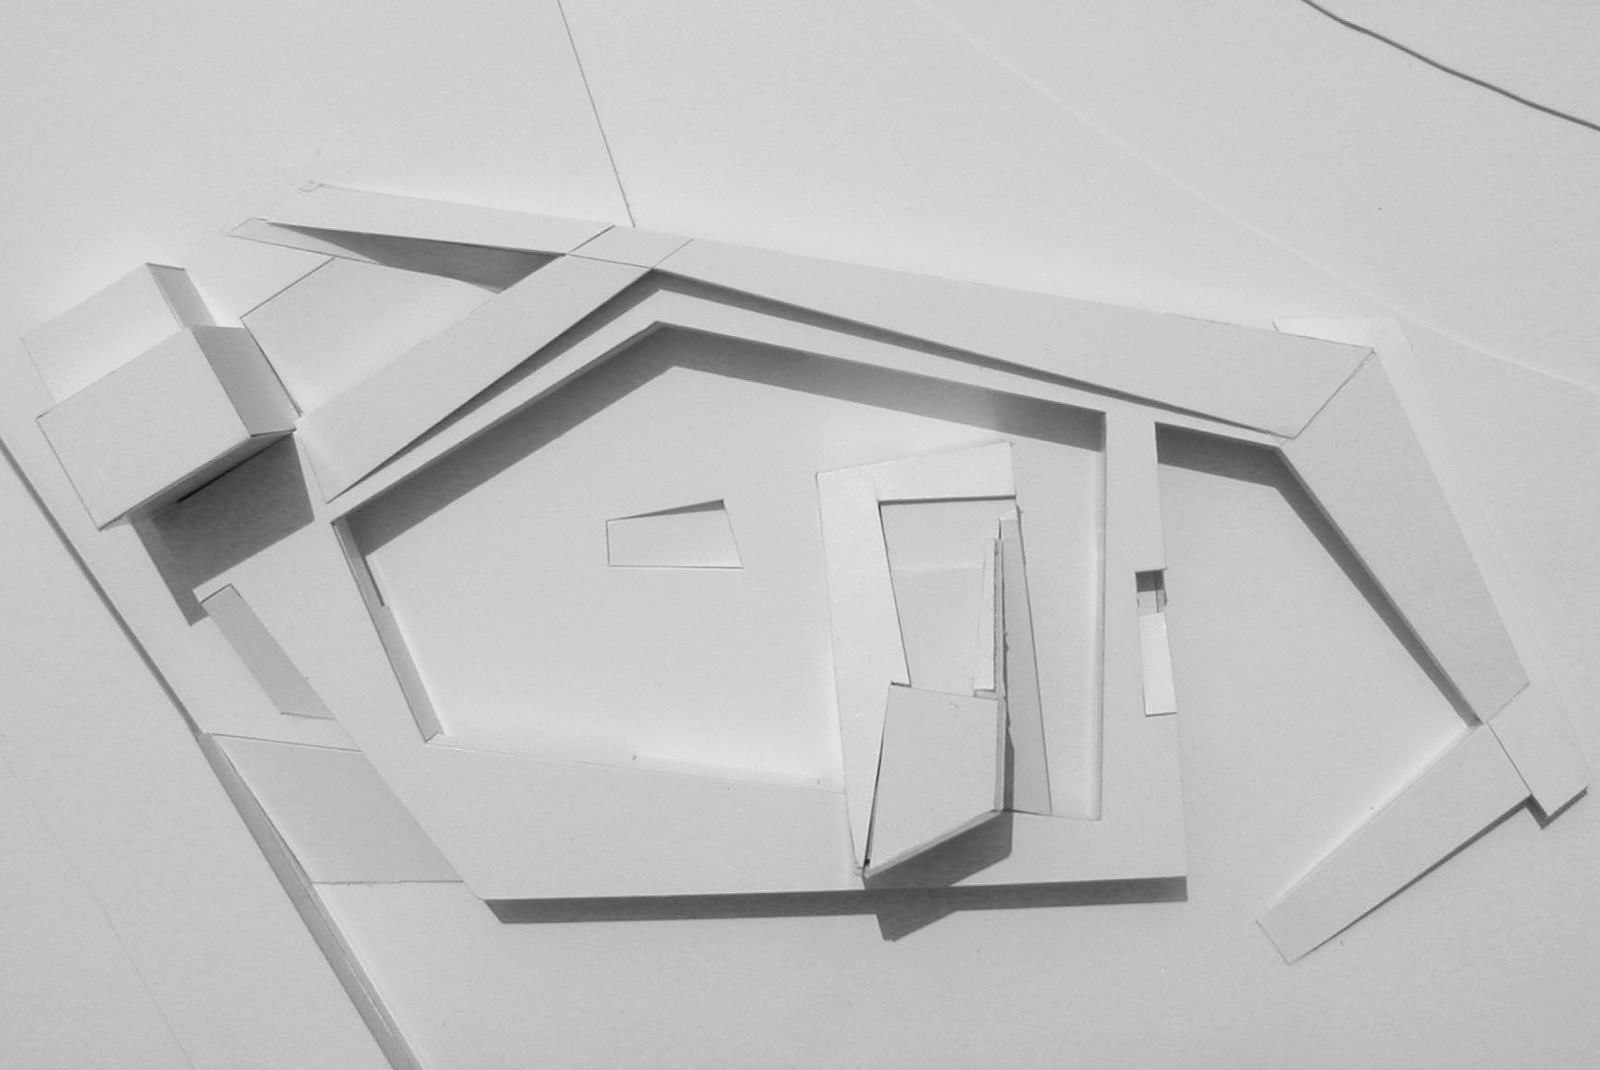 Europan7-8_model-plan.jpg